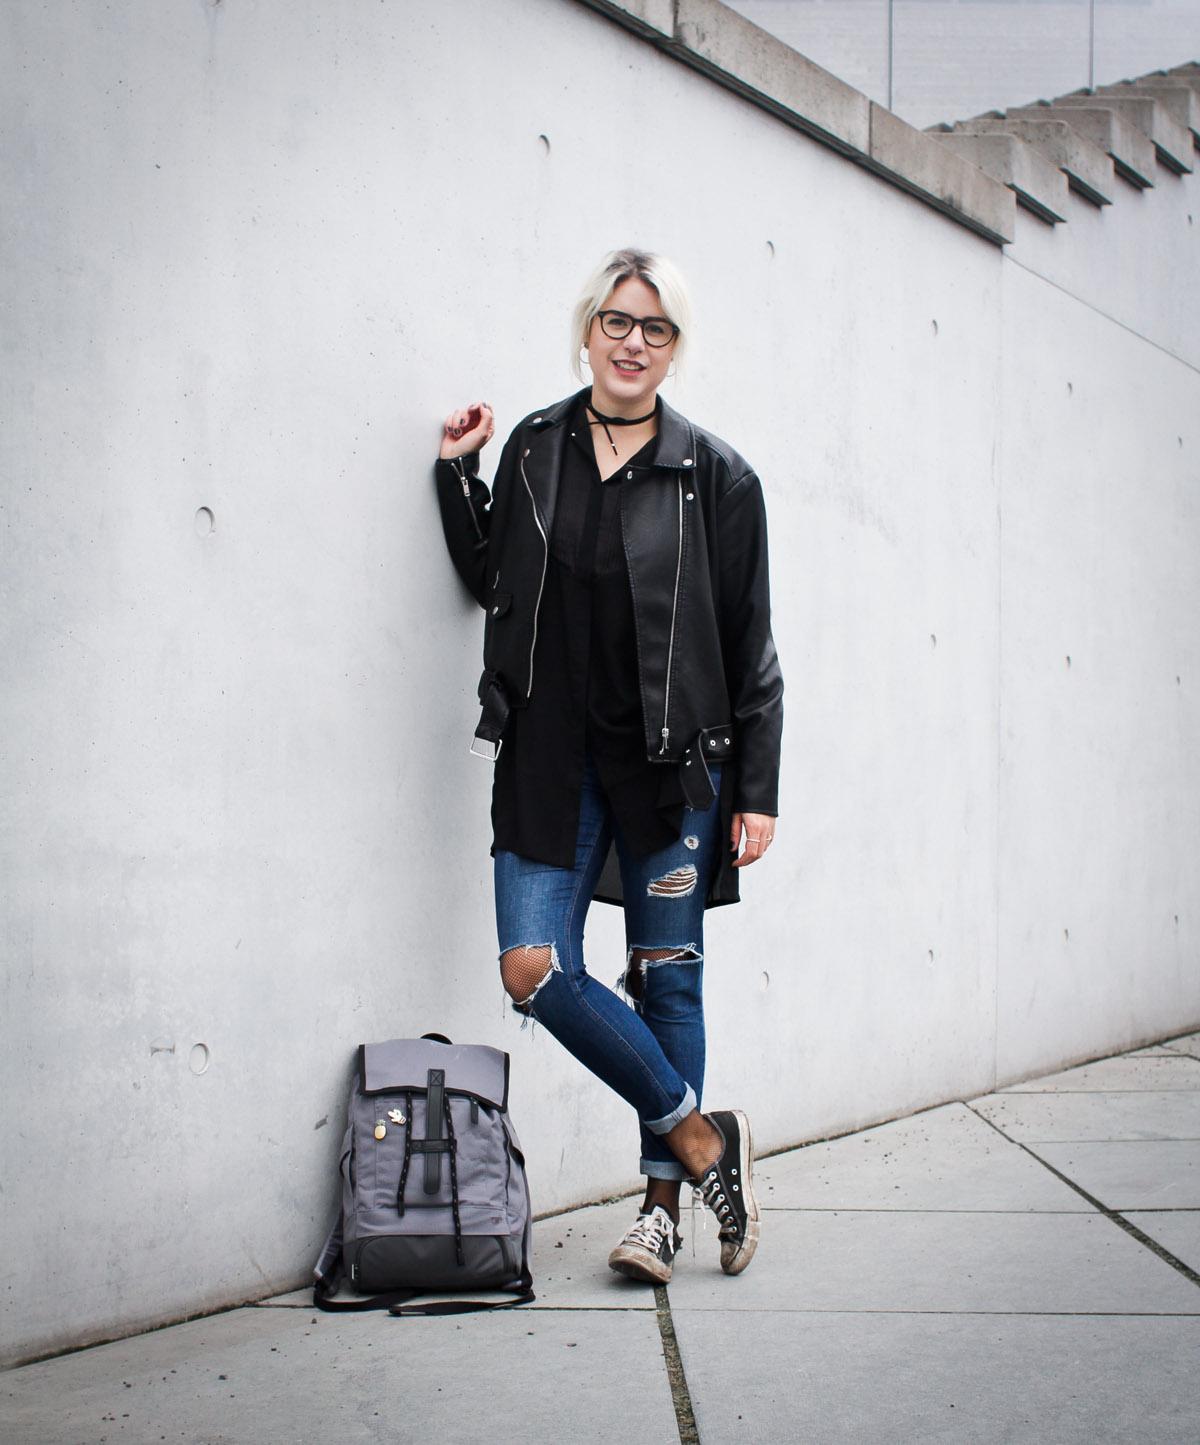 modeblog-berlin